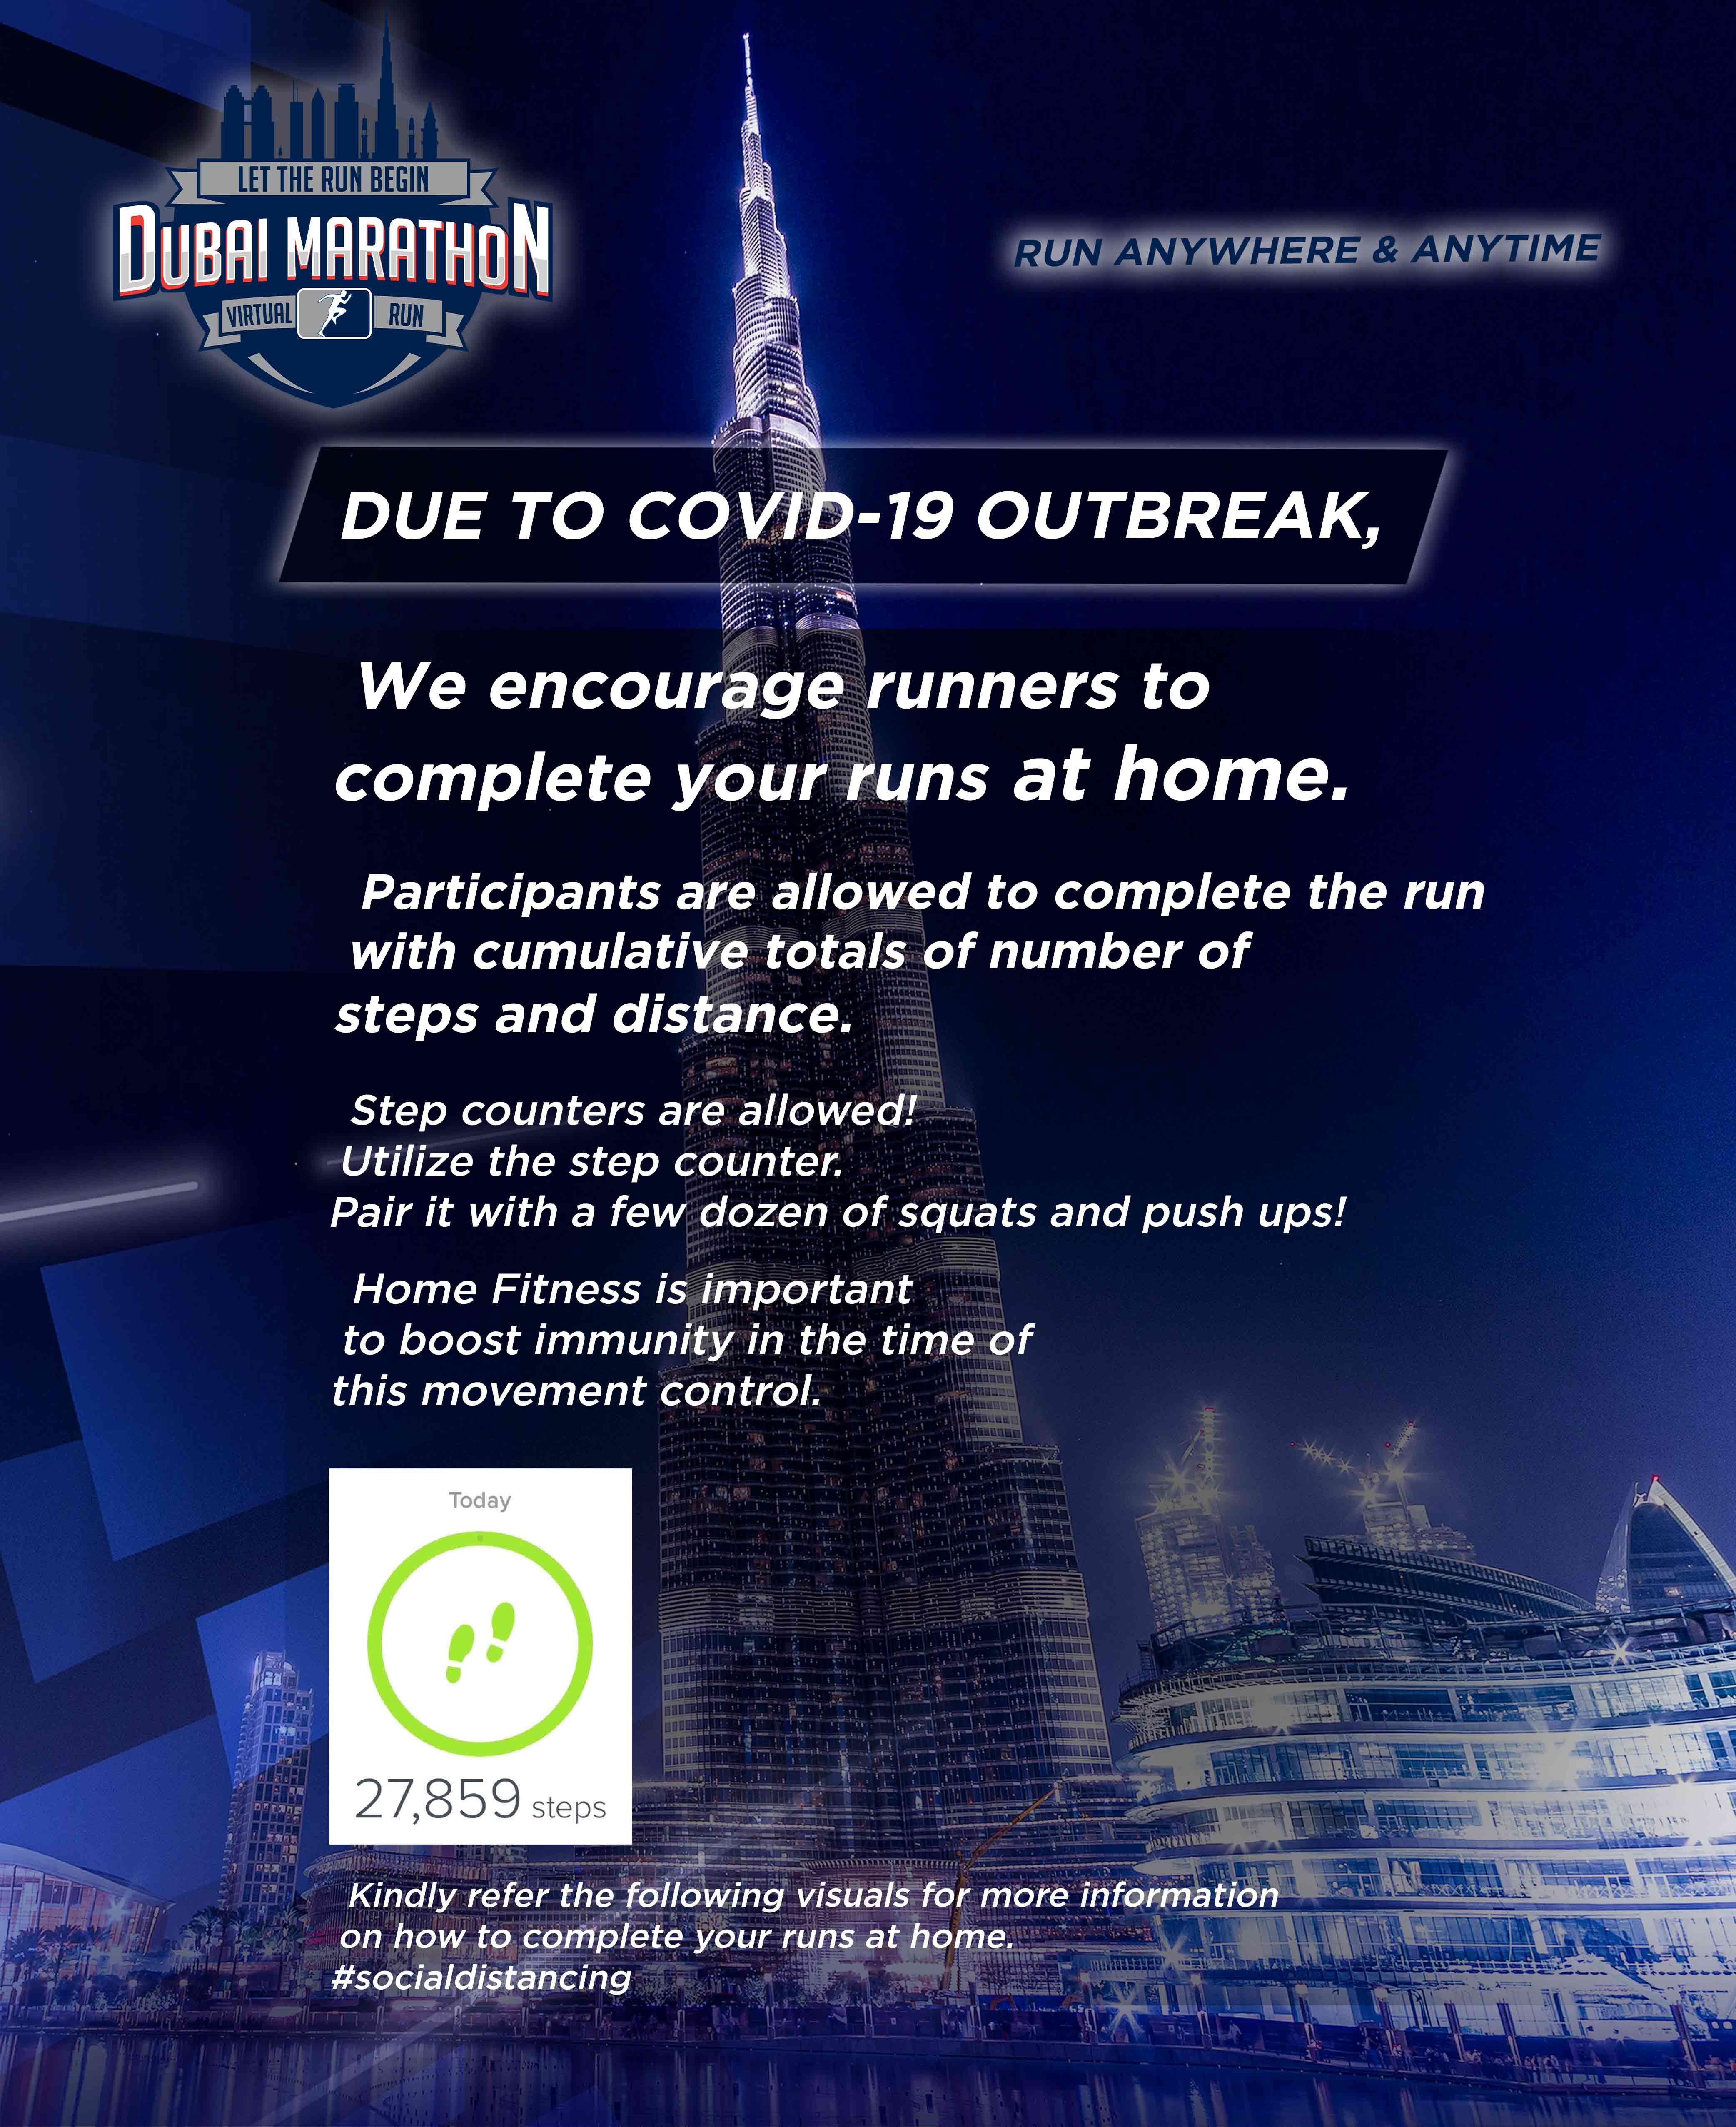 Dubai Marathon Virtual Run - Indonesia